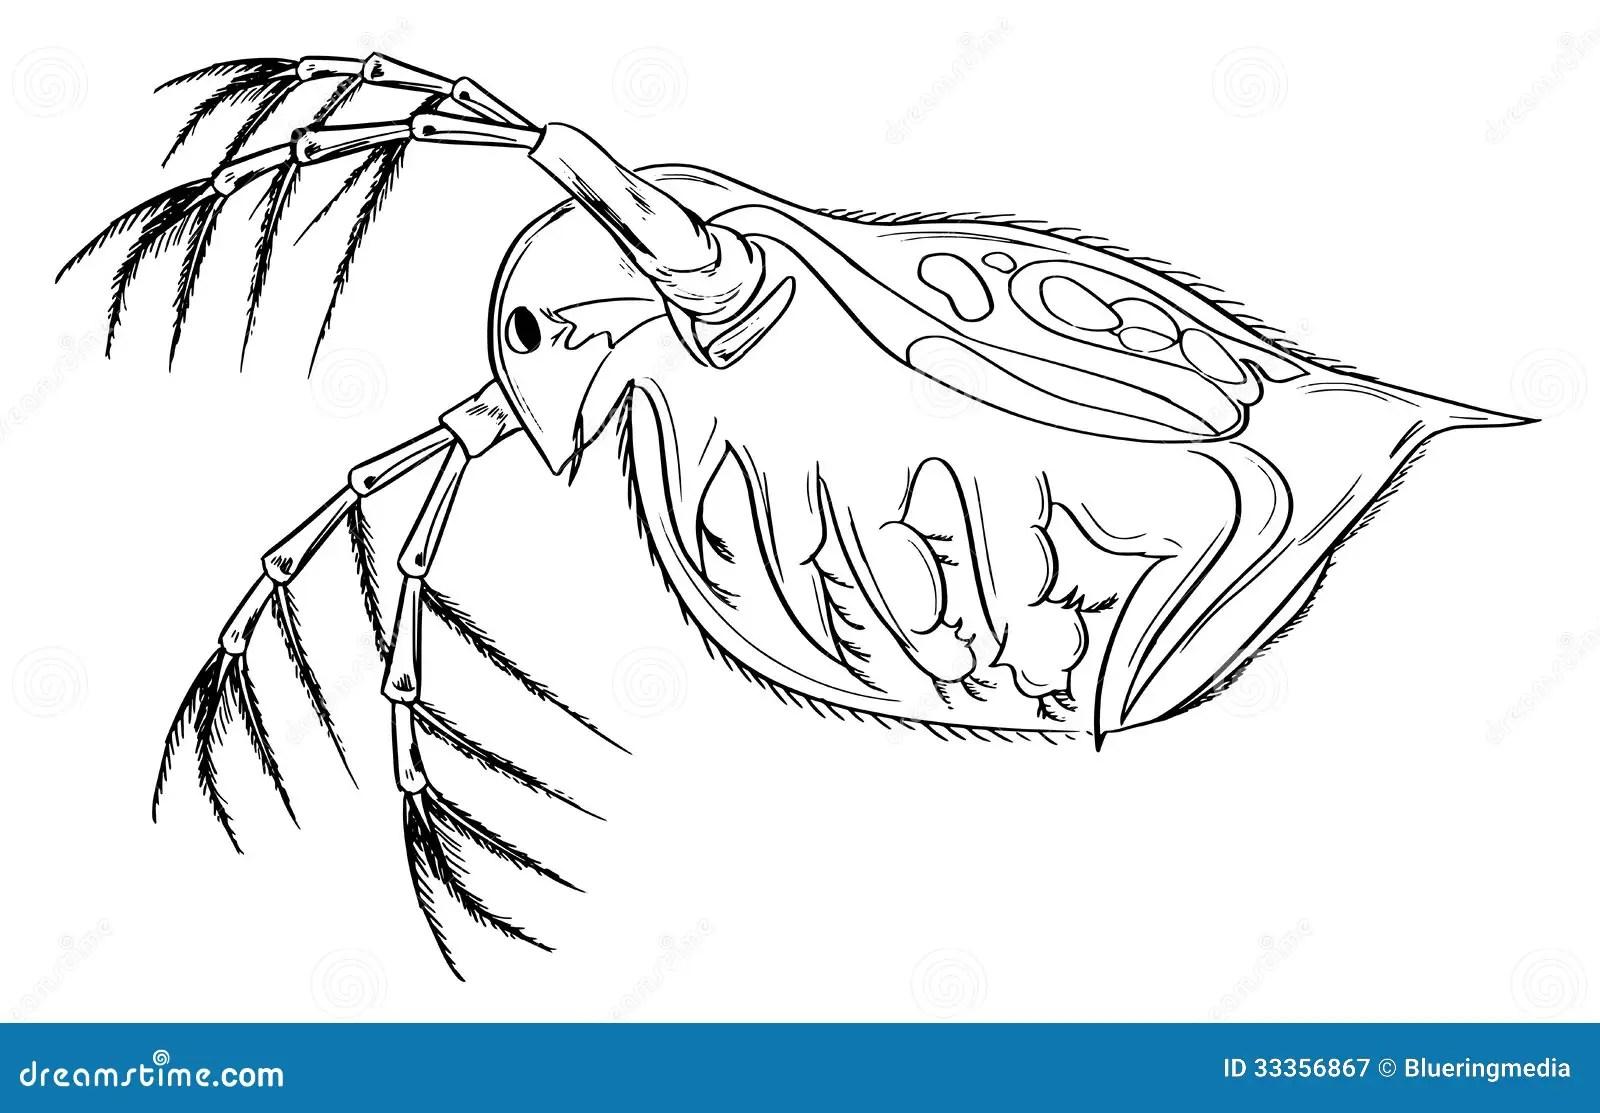 Daphnia Cartoons Illustrations Amp Vector Stock Images